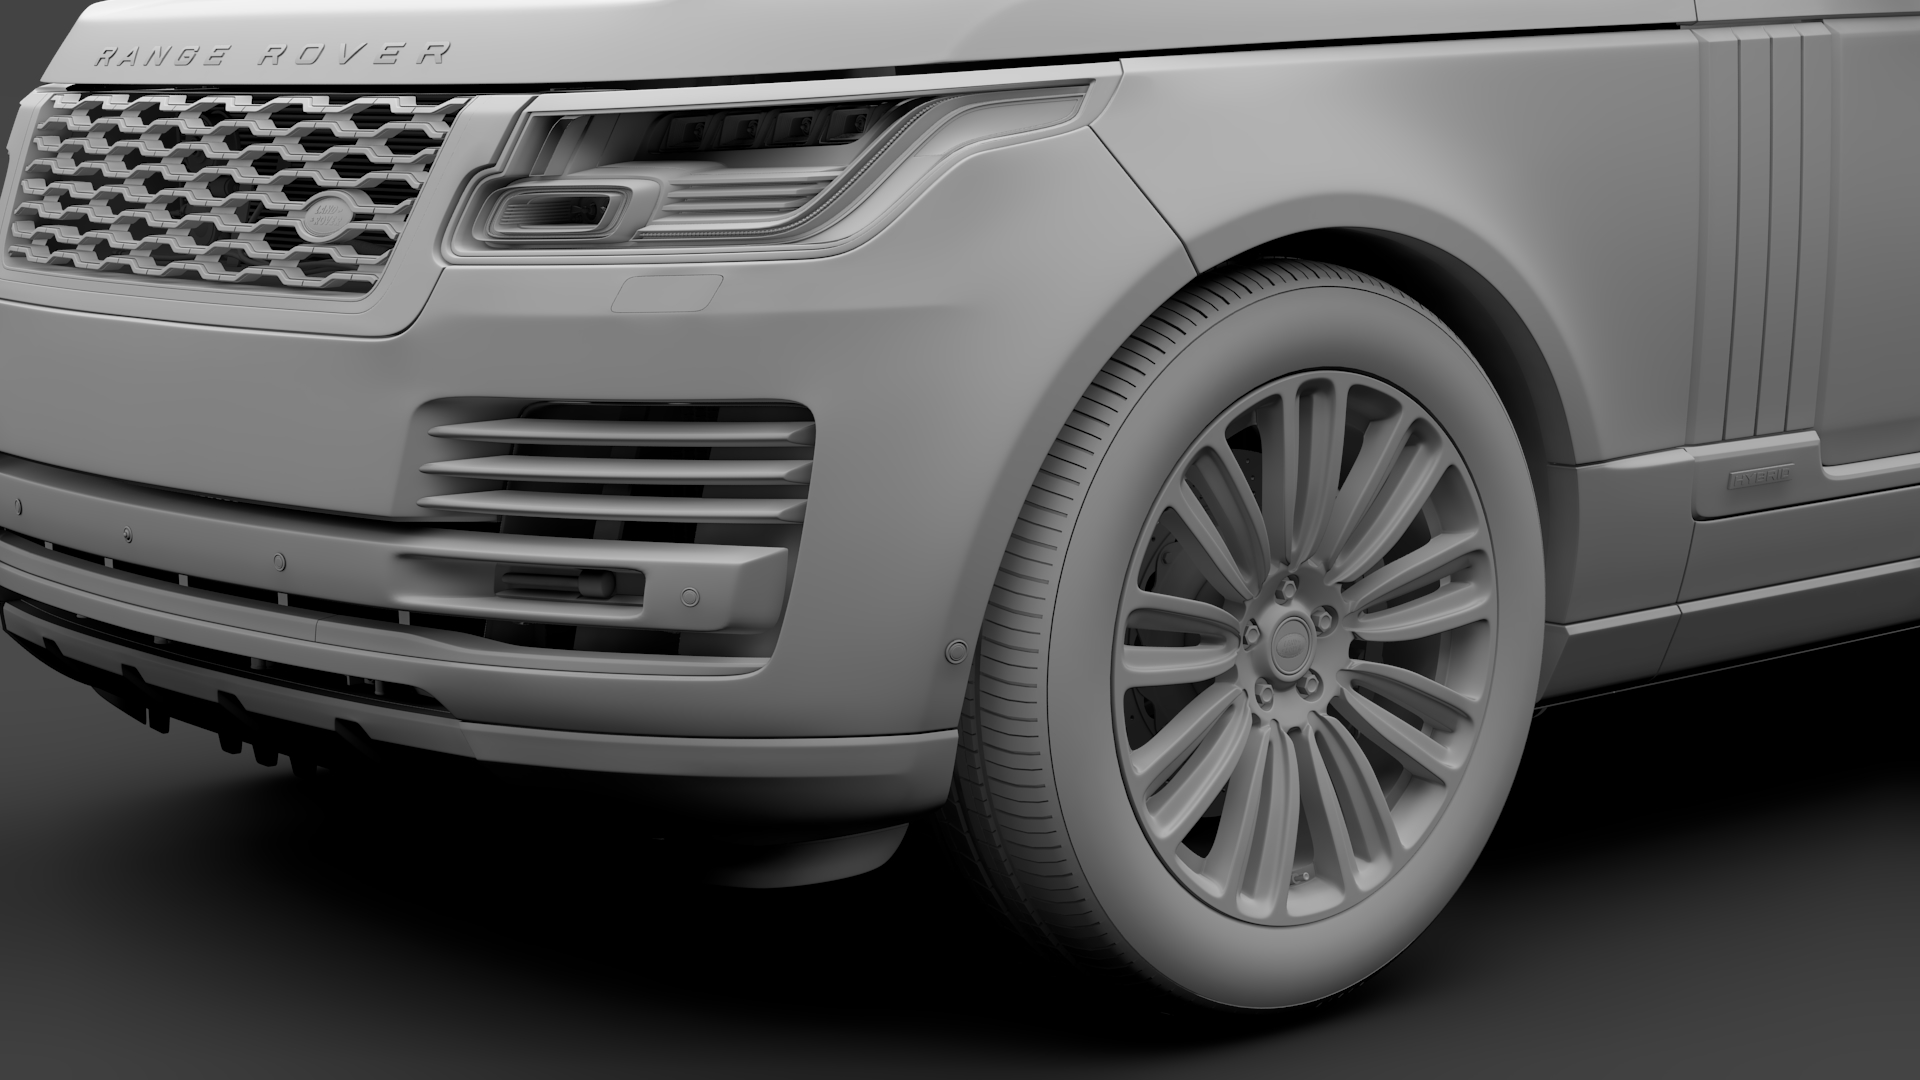 range rover autobiography hybrid (l405) 2018 3d model max fbx c4d lwo ma mb hrc xsi obj 278153